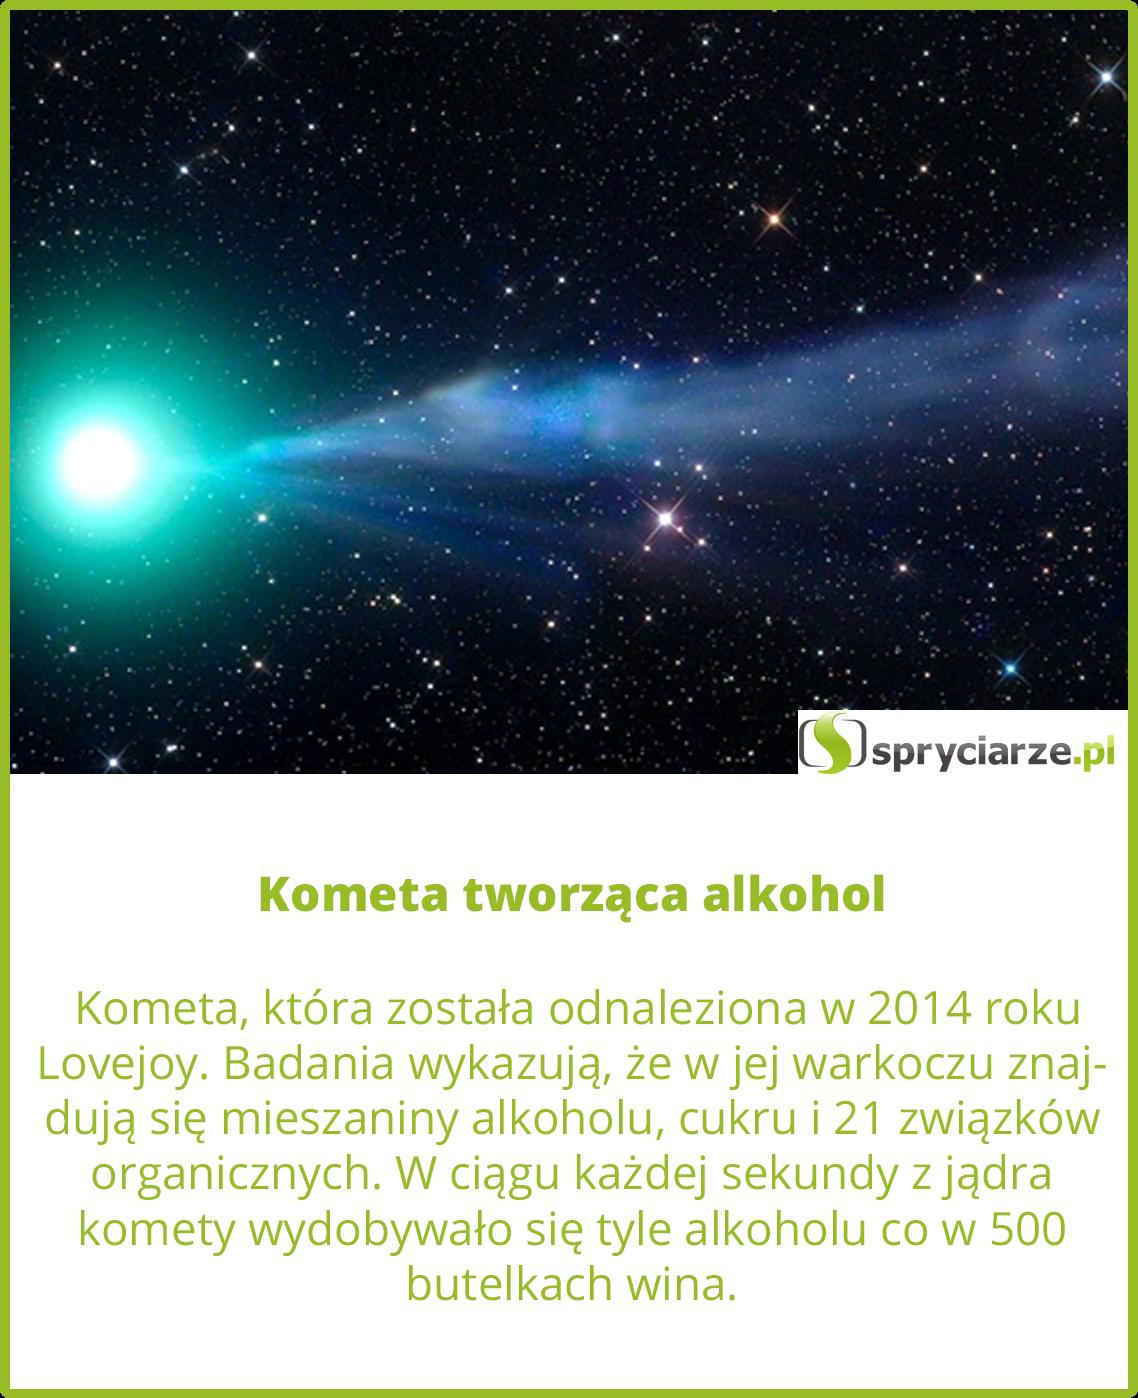 Kometa tworząca alkohol